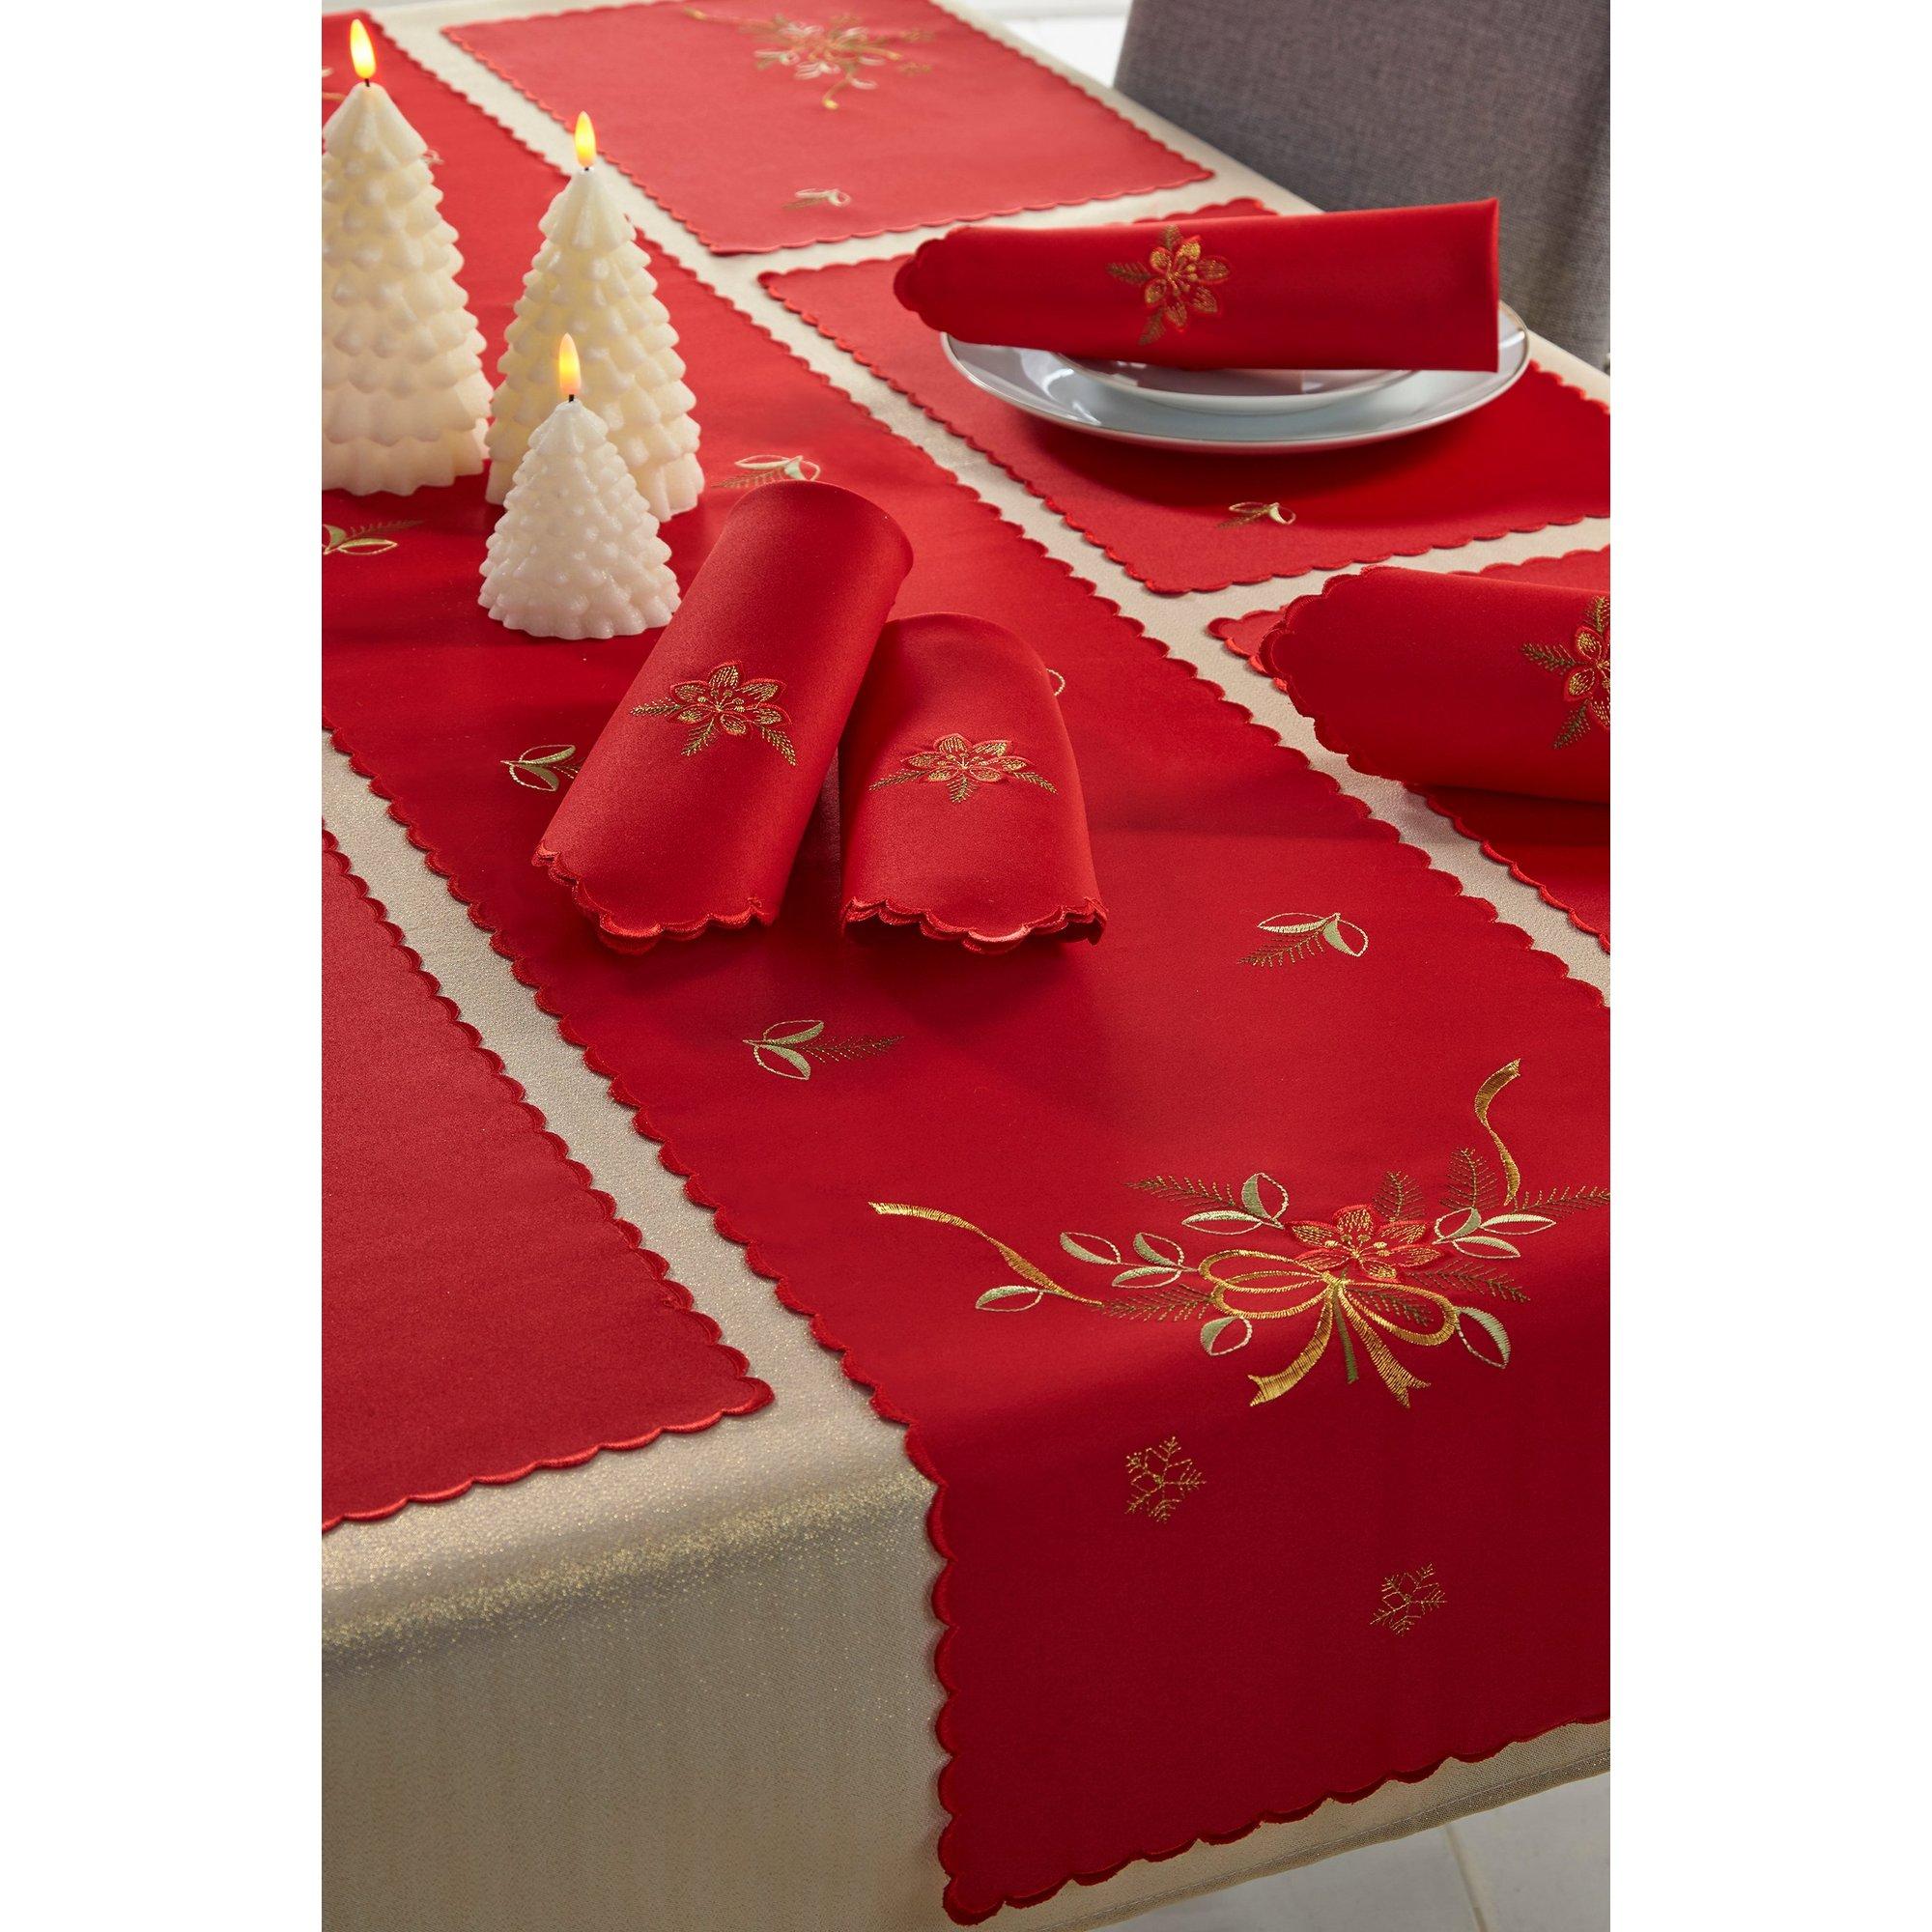 Image of 14-Piece Festive Poinsettia Christmas Table Set